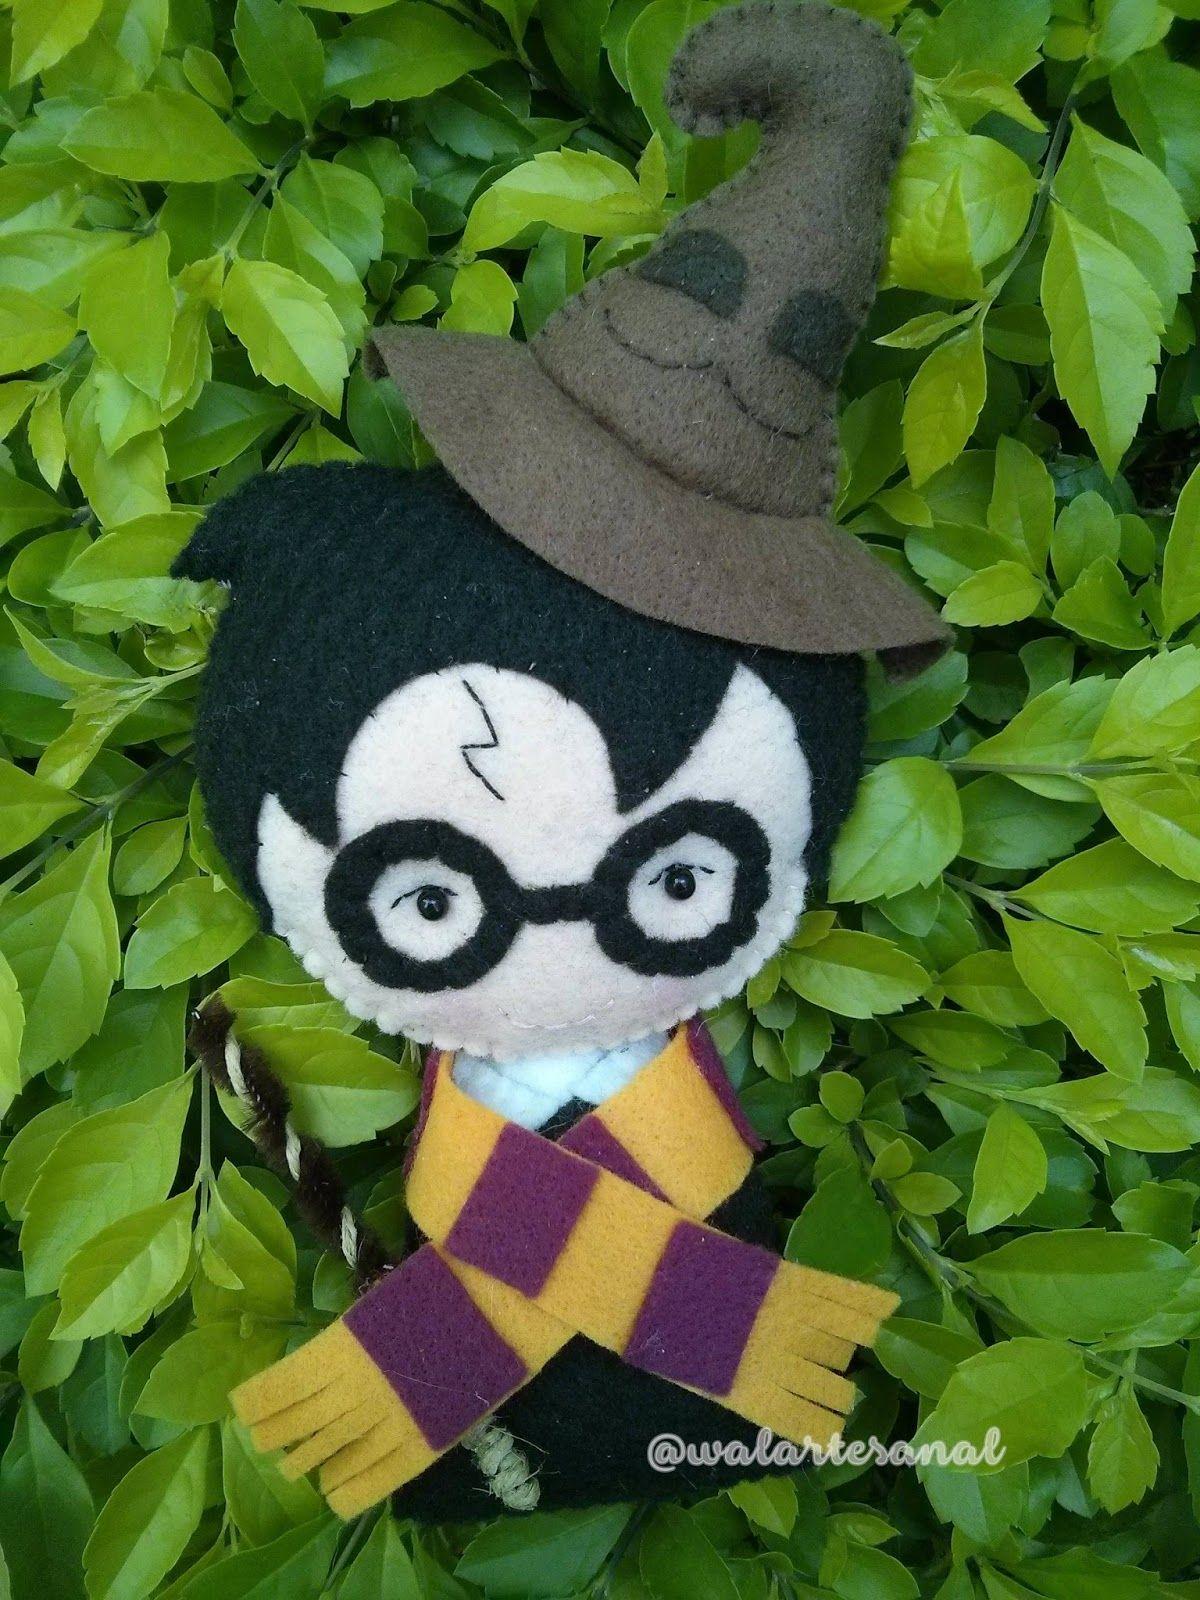 Lançamento] Molde Artesanal Digital Harry Potter Personagens: Harry ...